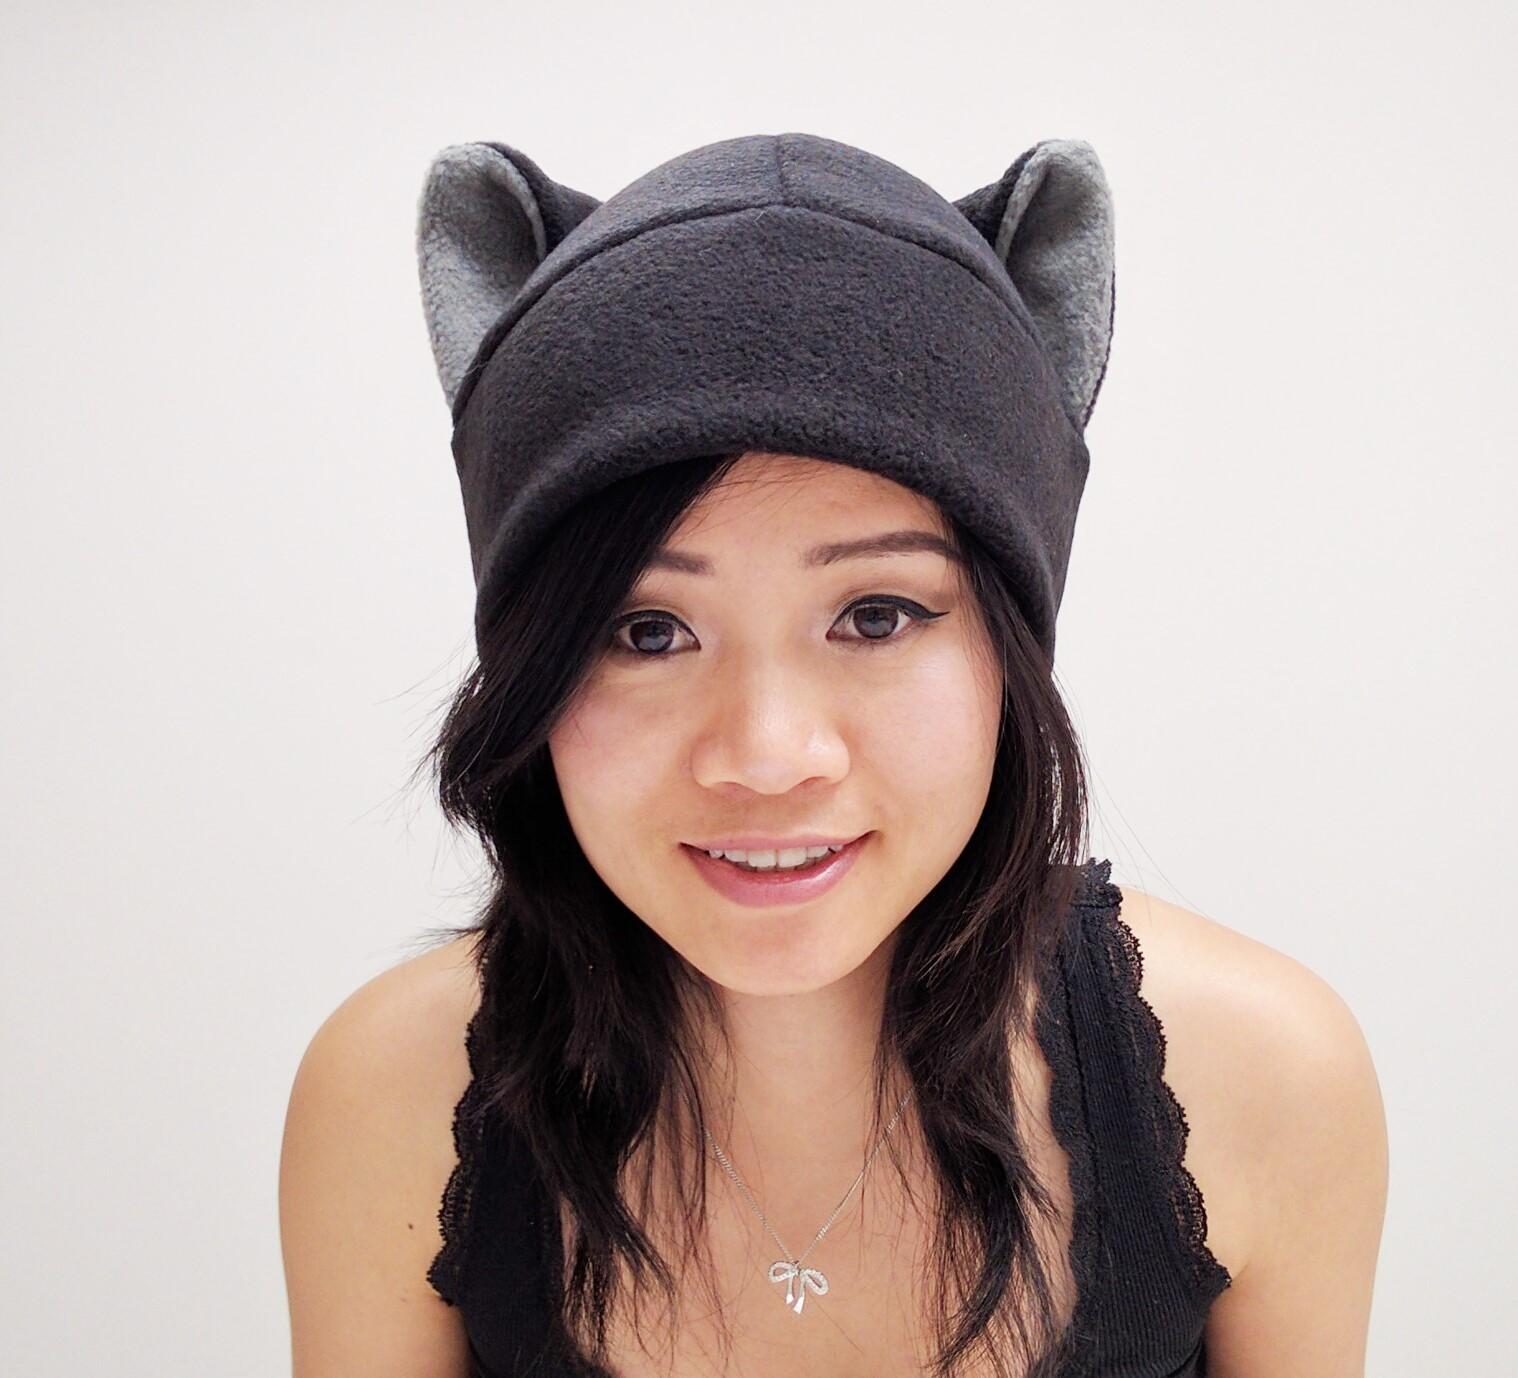 Black Cat Ear Hat - Cat Hat - Cat Fleece Hat - Black Beanie Cat Hat ... a24426e90c5